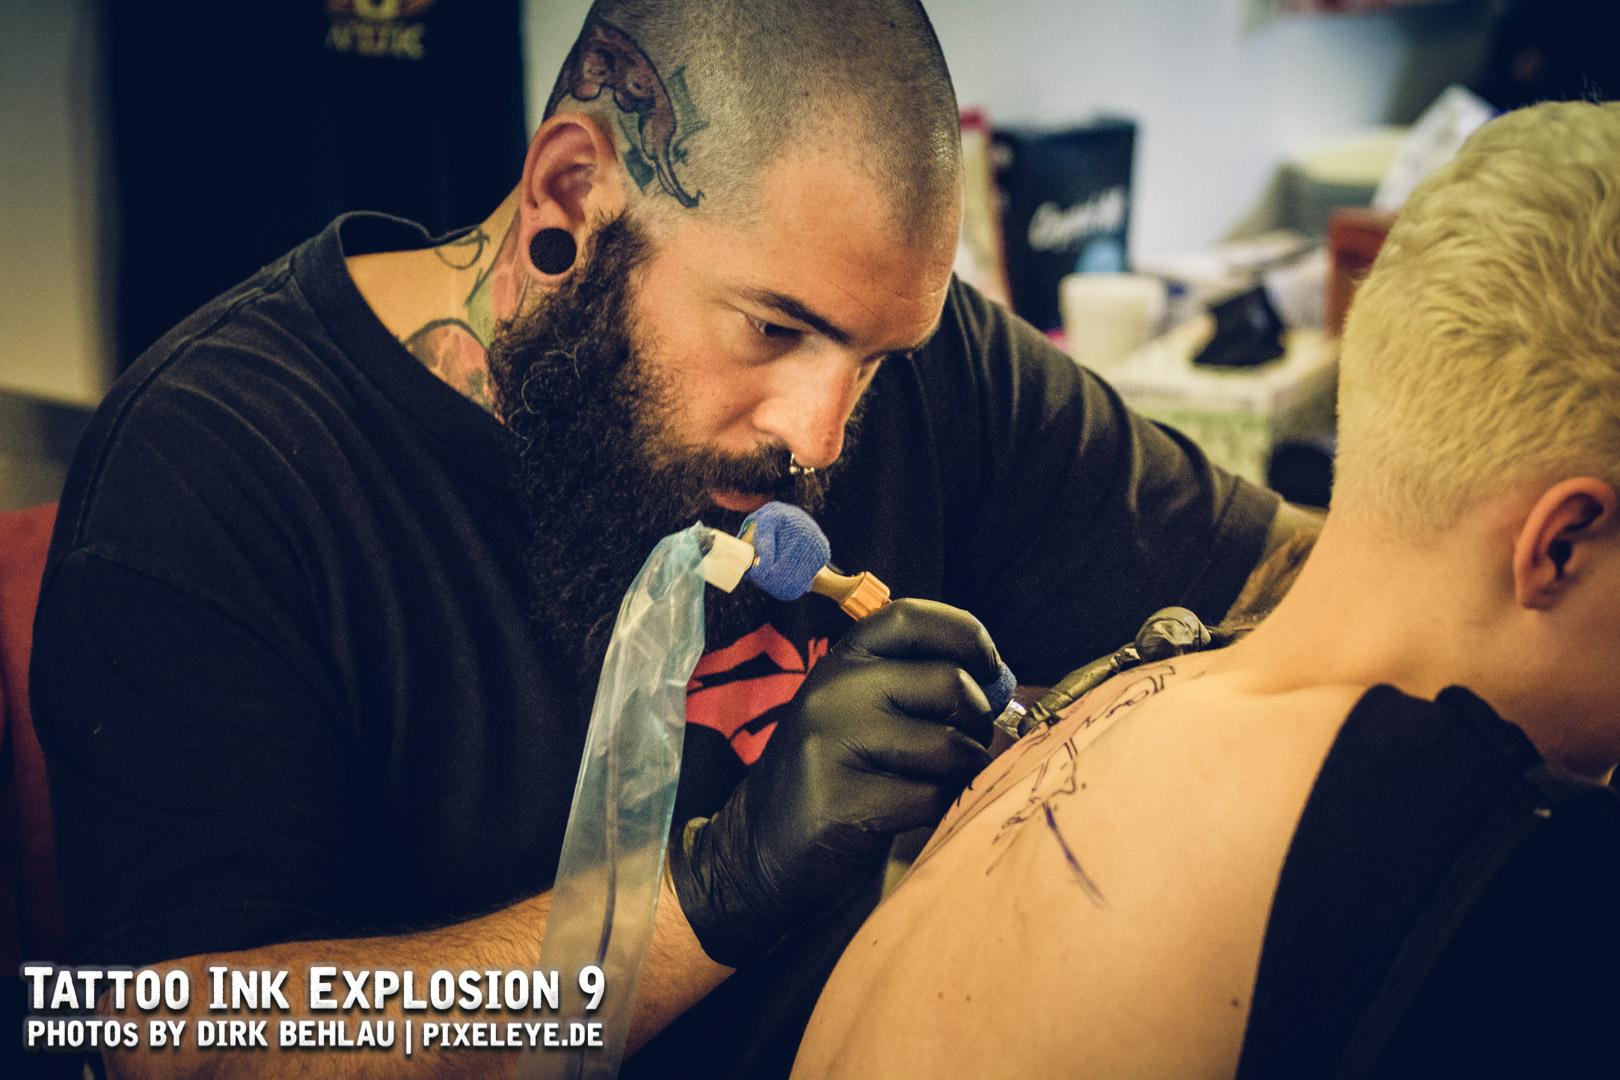 Tattoo Ink Explosion 2018 WEB by Dirk Behlau-1240.jpg